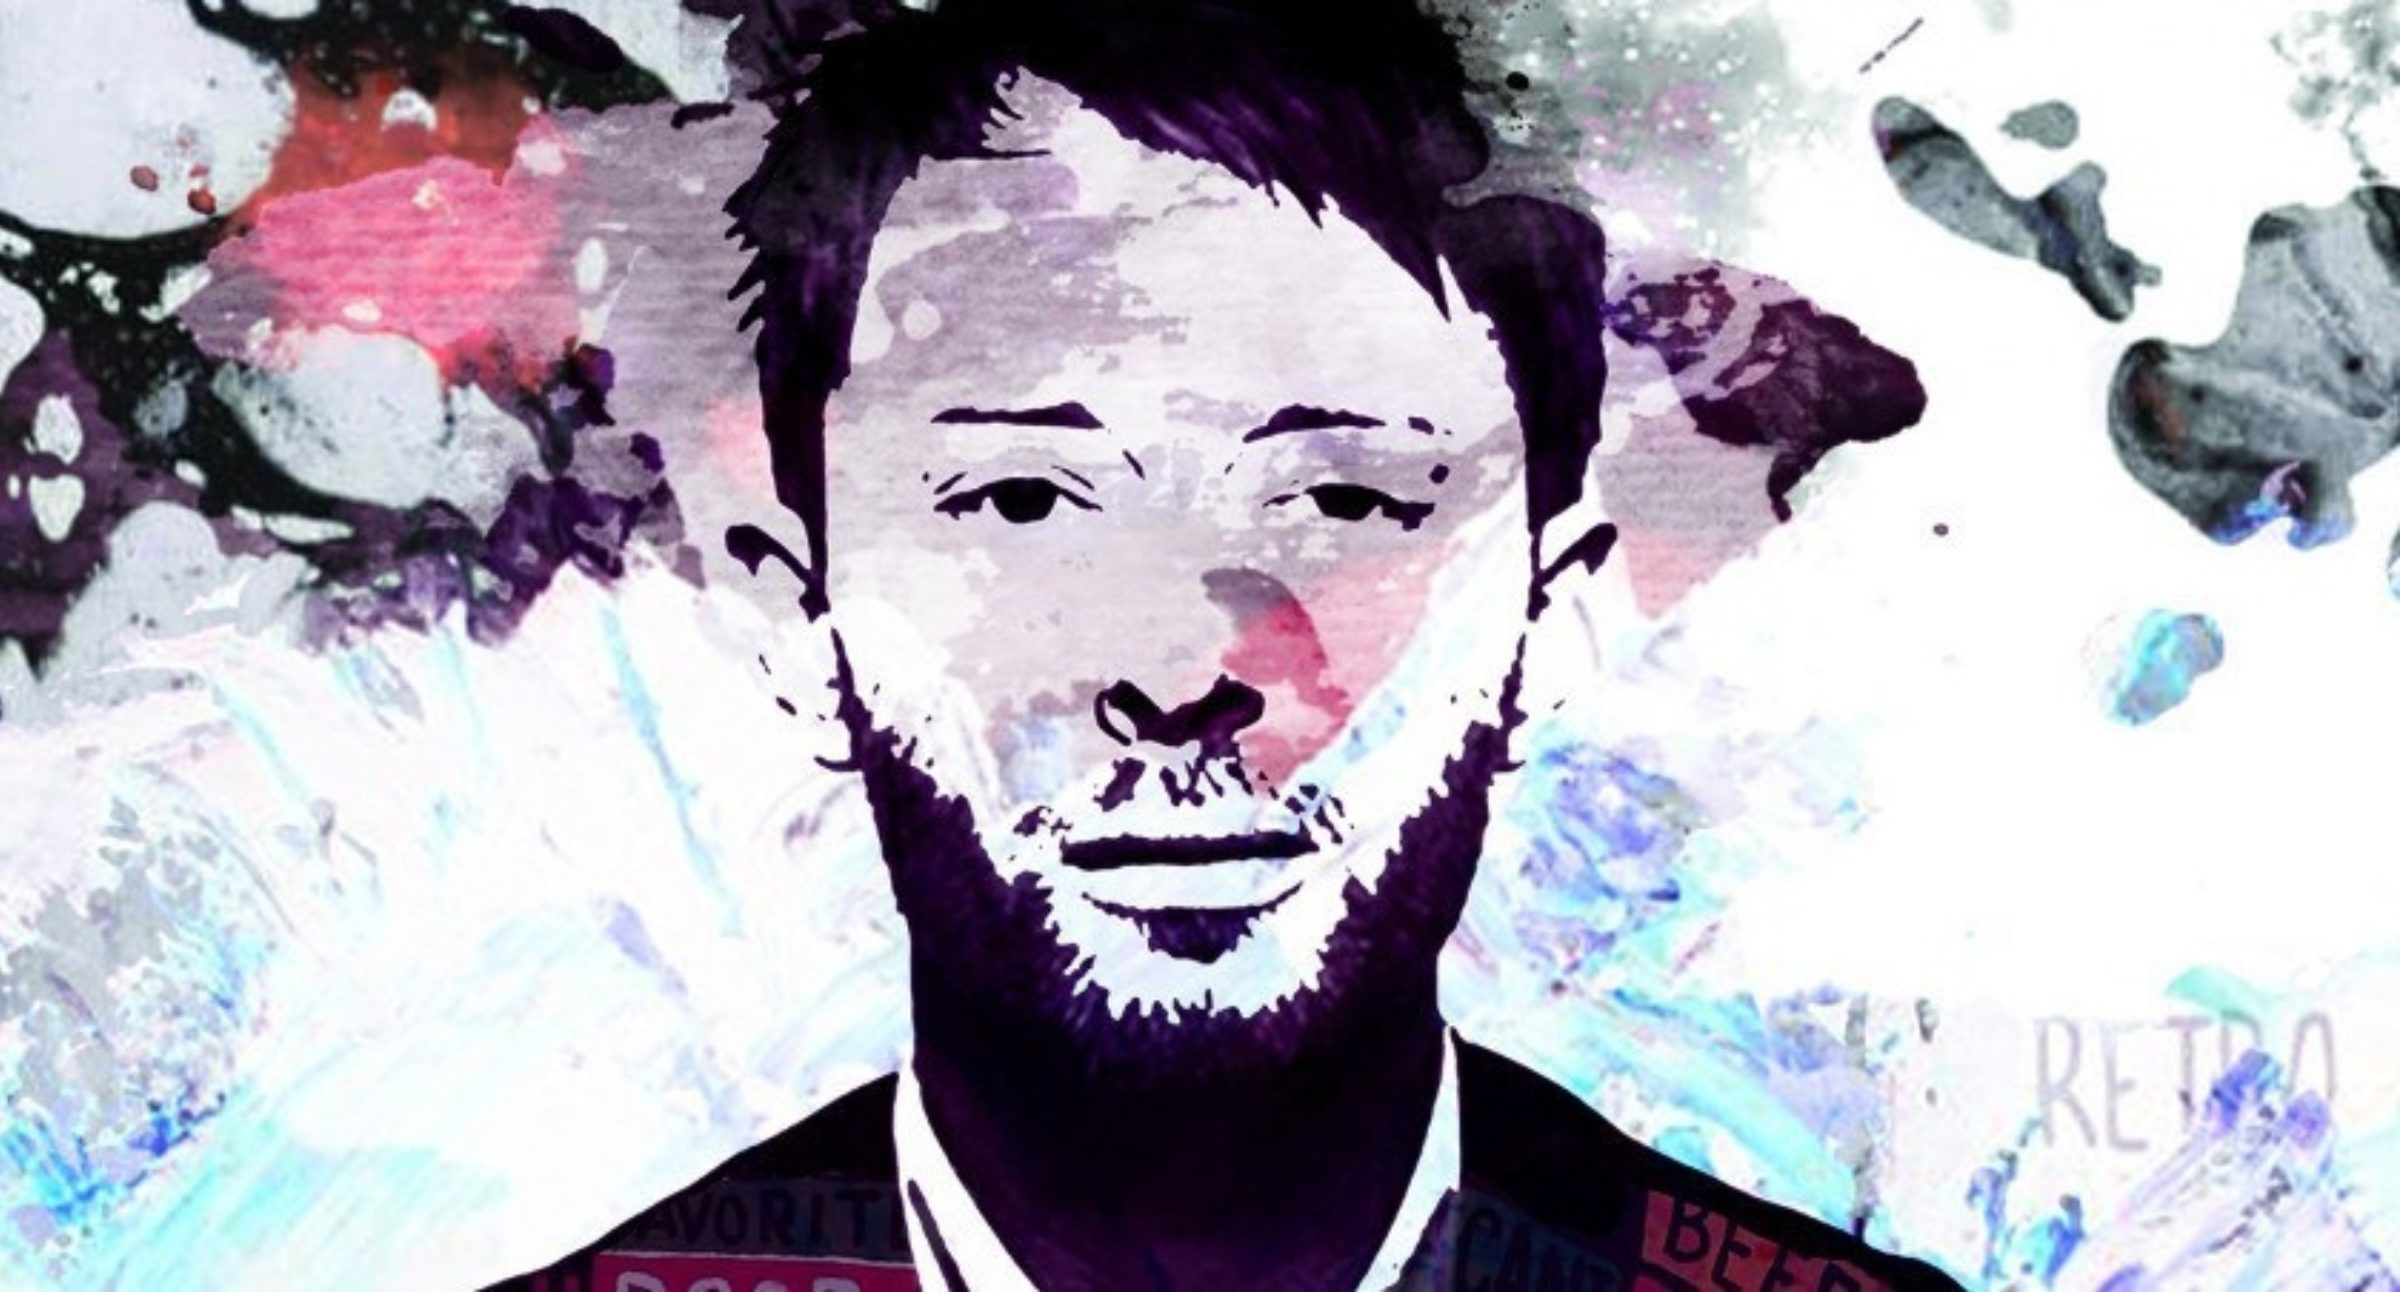 Tribute to radiohead 2738 1554884583 35hxfz3q5d